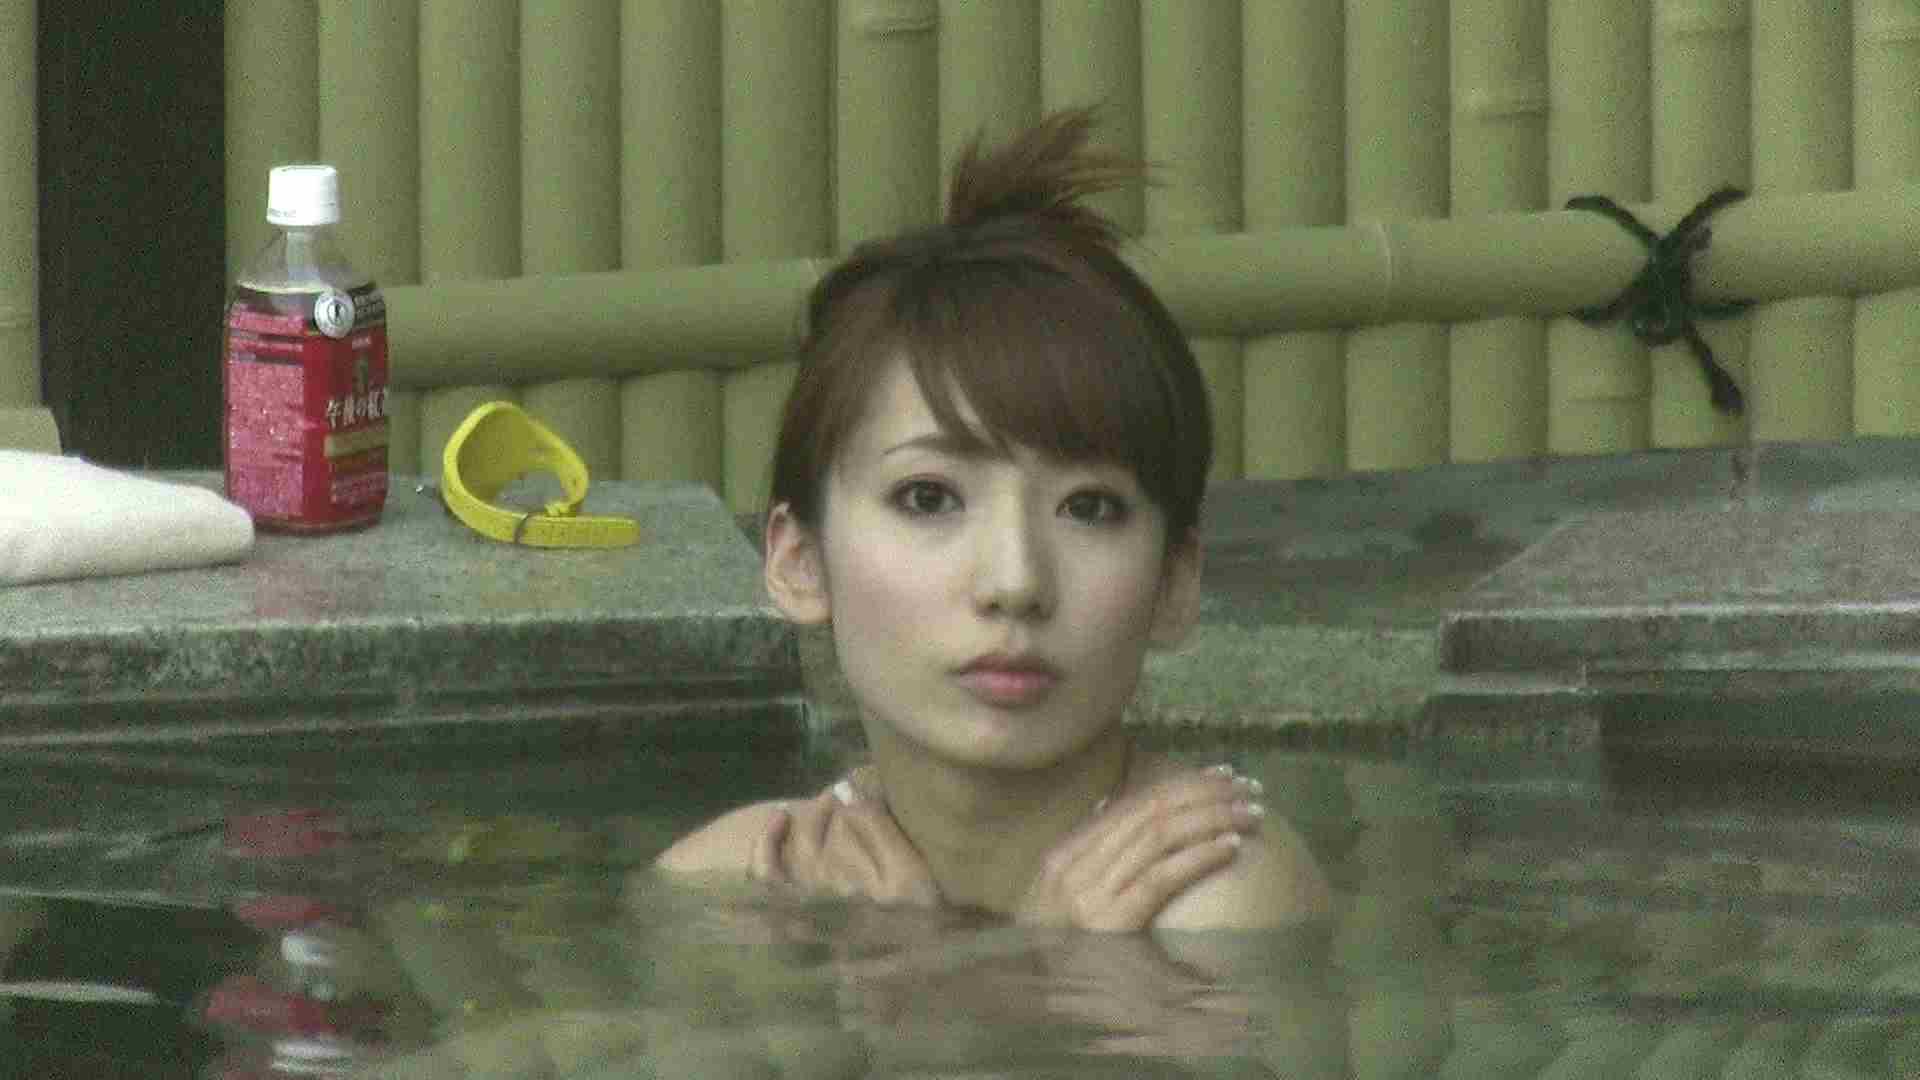 Aquaな露天風呂Vol.208 HなOL   盗撮  101pic 4